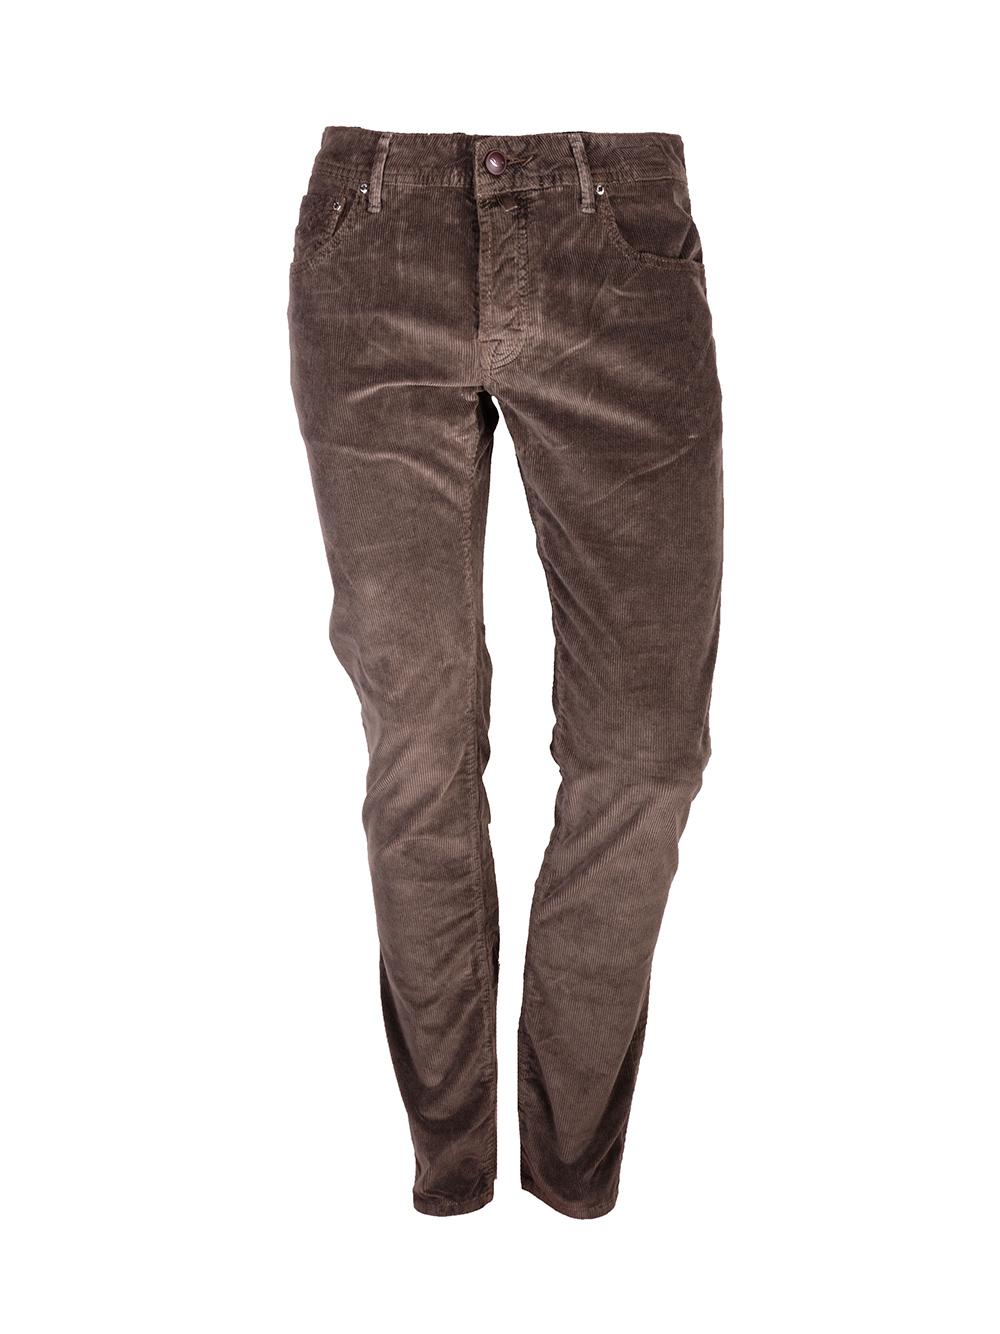 JACOB COHEN Παντελόνι Jeans J622 COMF02077V-480 ΚΑΦΕ